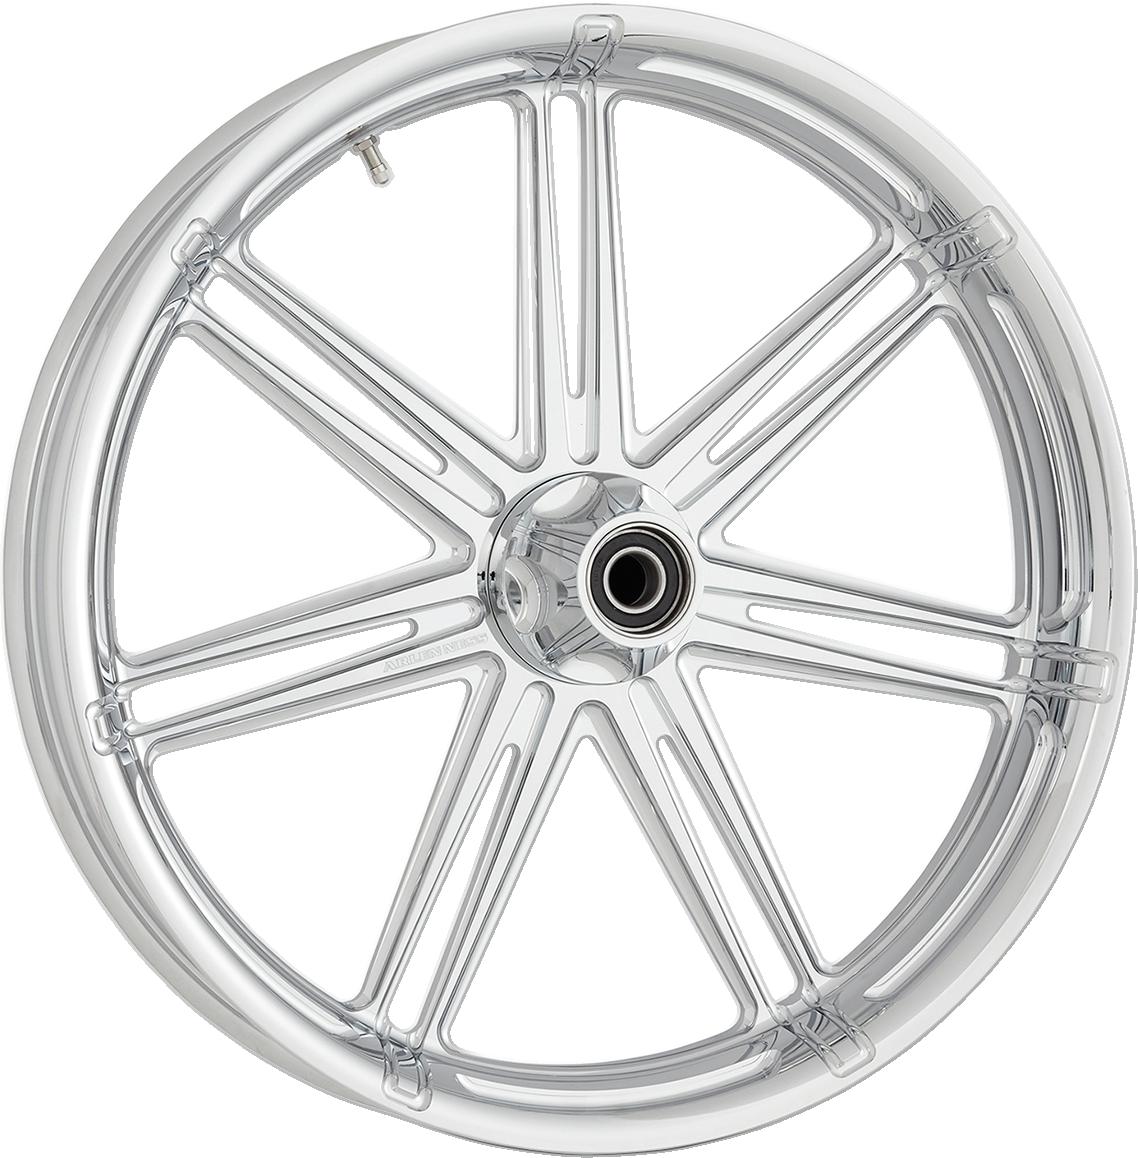 "Arlen Ness 7 Valve Chrome 21"" x 3.5"" ABS Front Wheel for 08-19 Harley Touring"